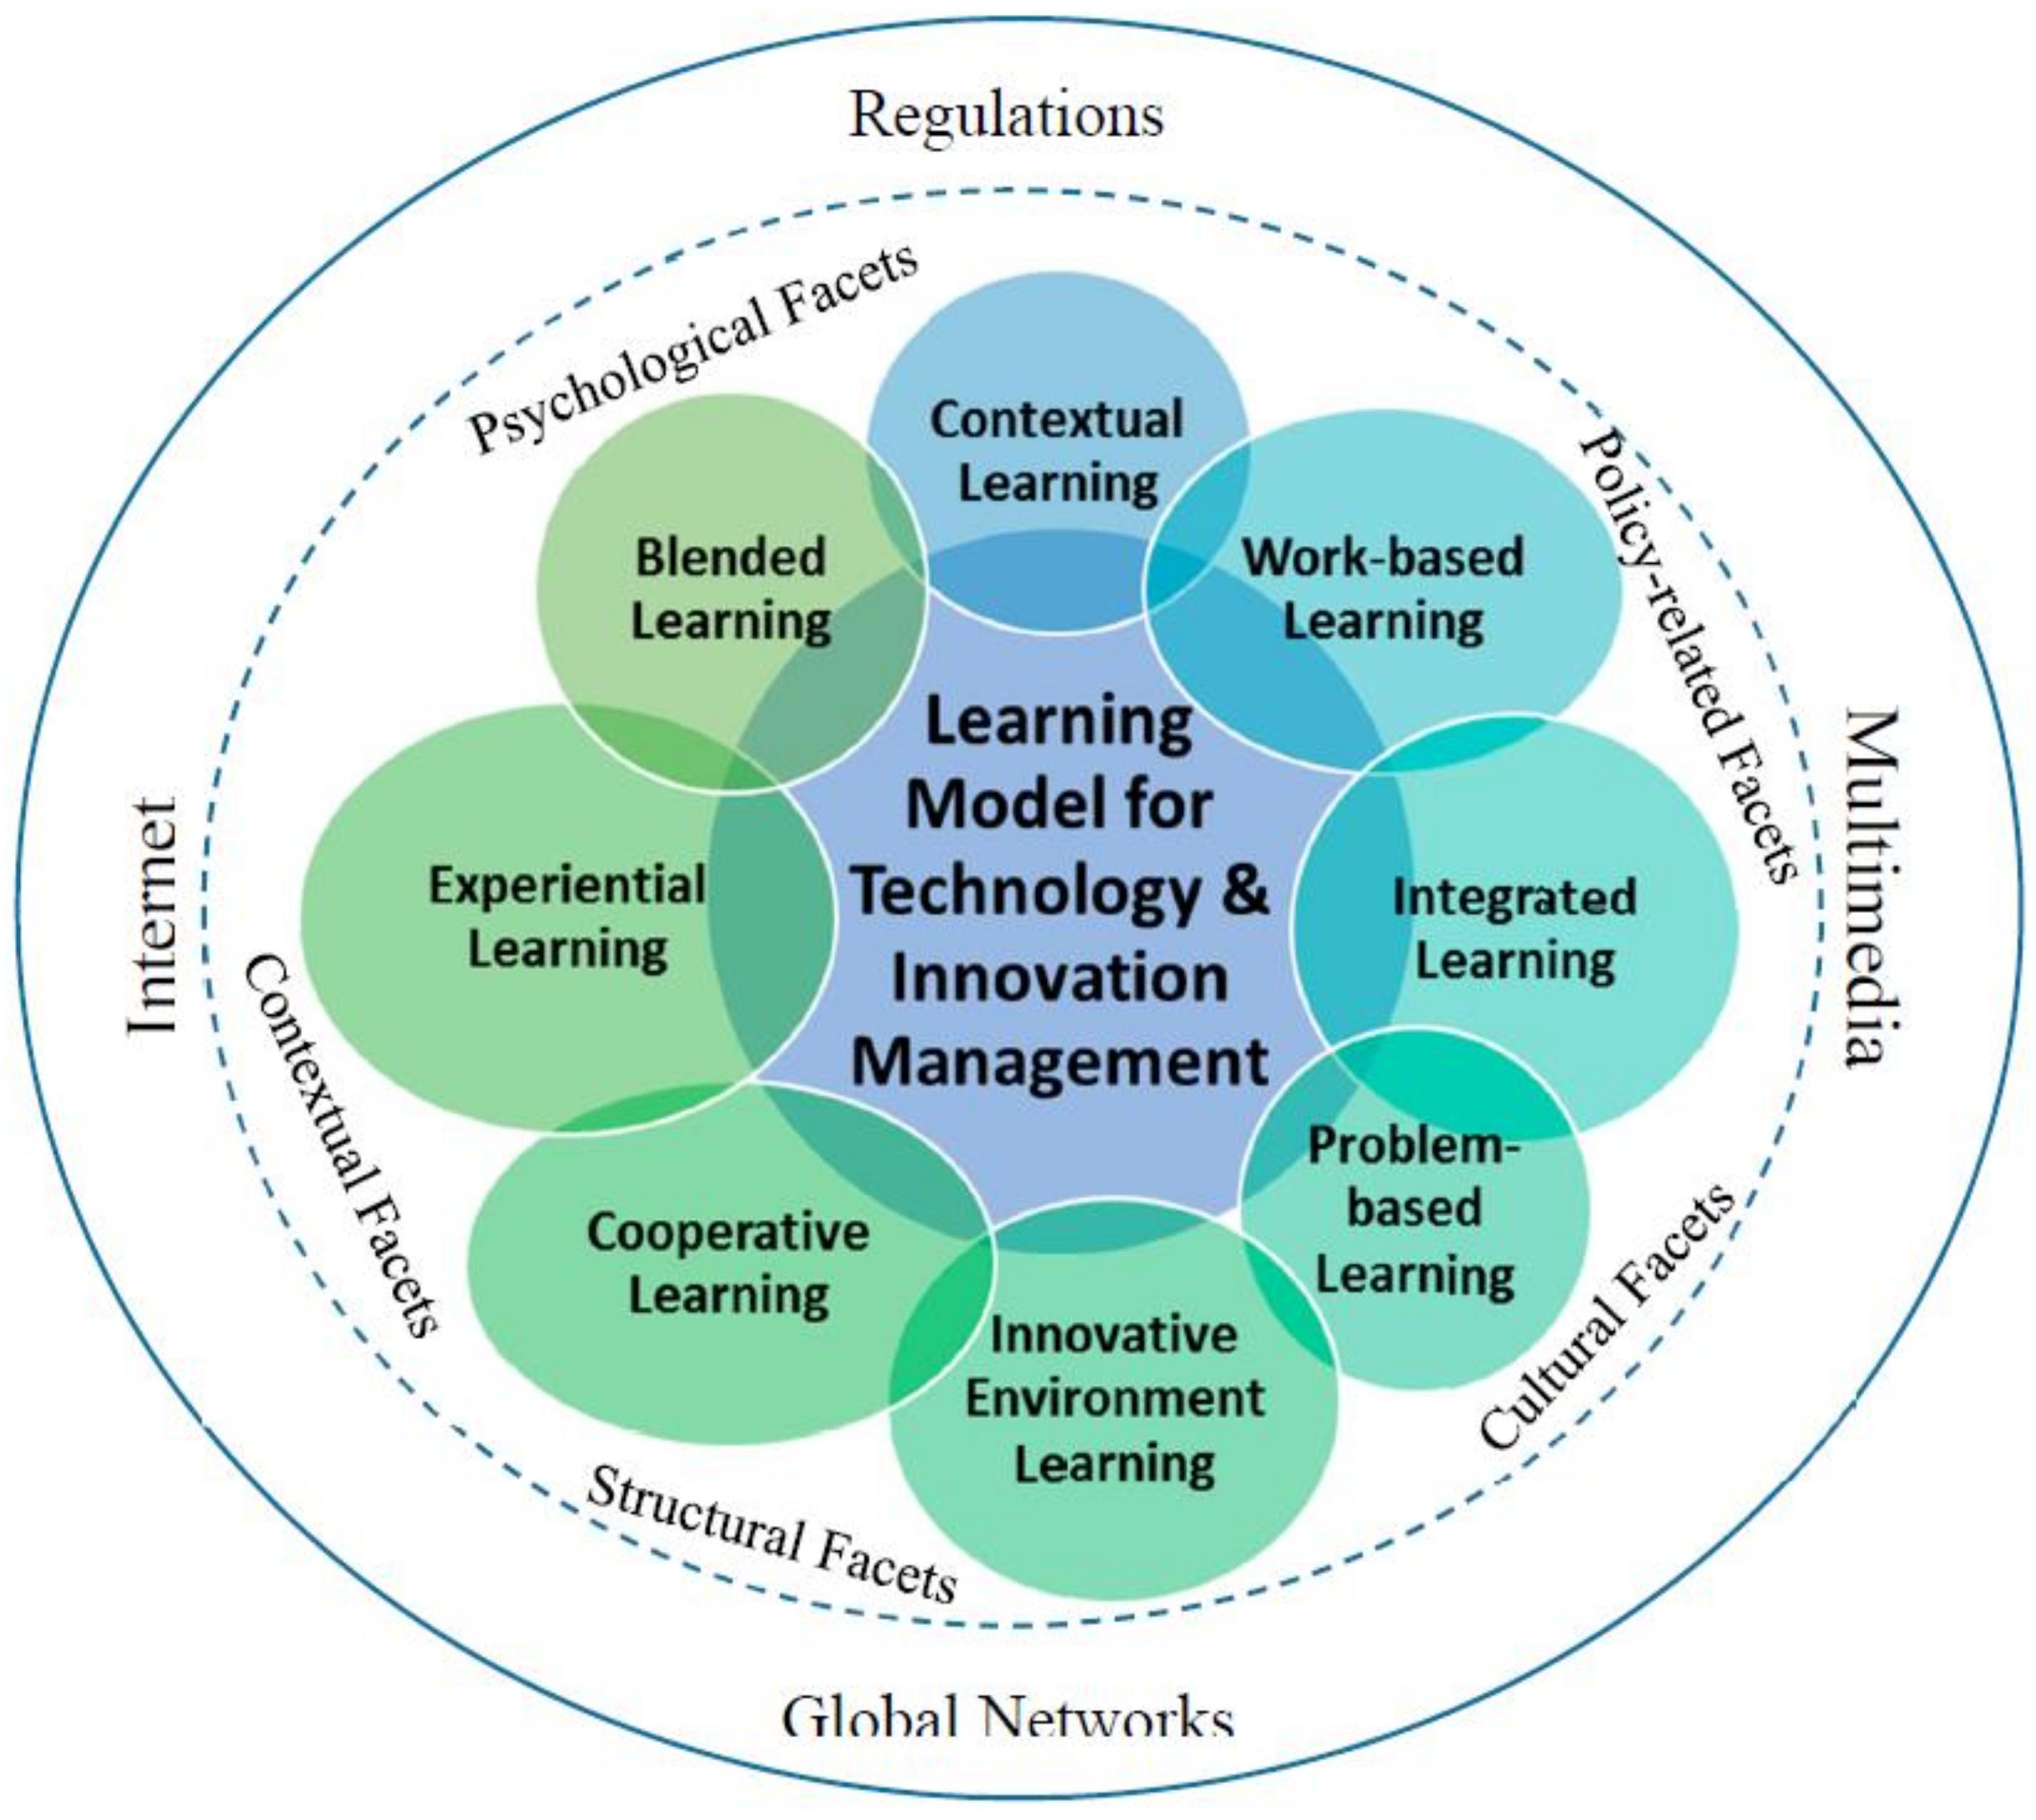 Technology Management Image: Administrative Sciences